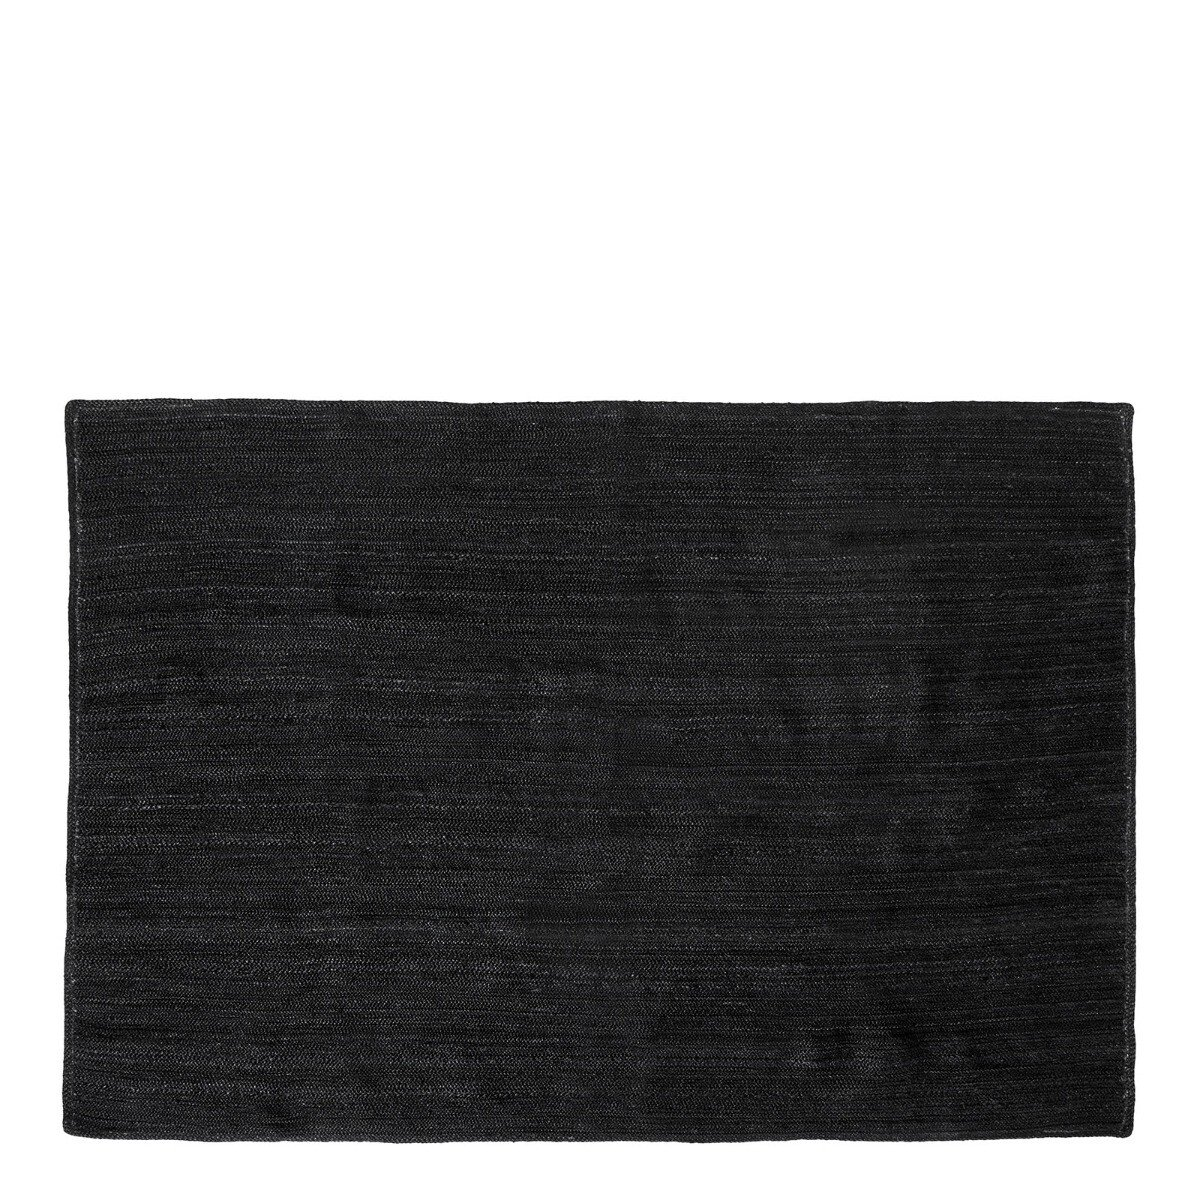 Nordal Vloerkleed Jute Zwart 240 x 160